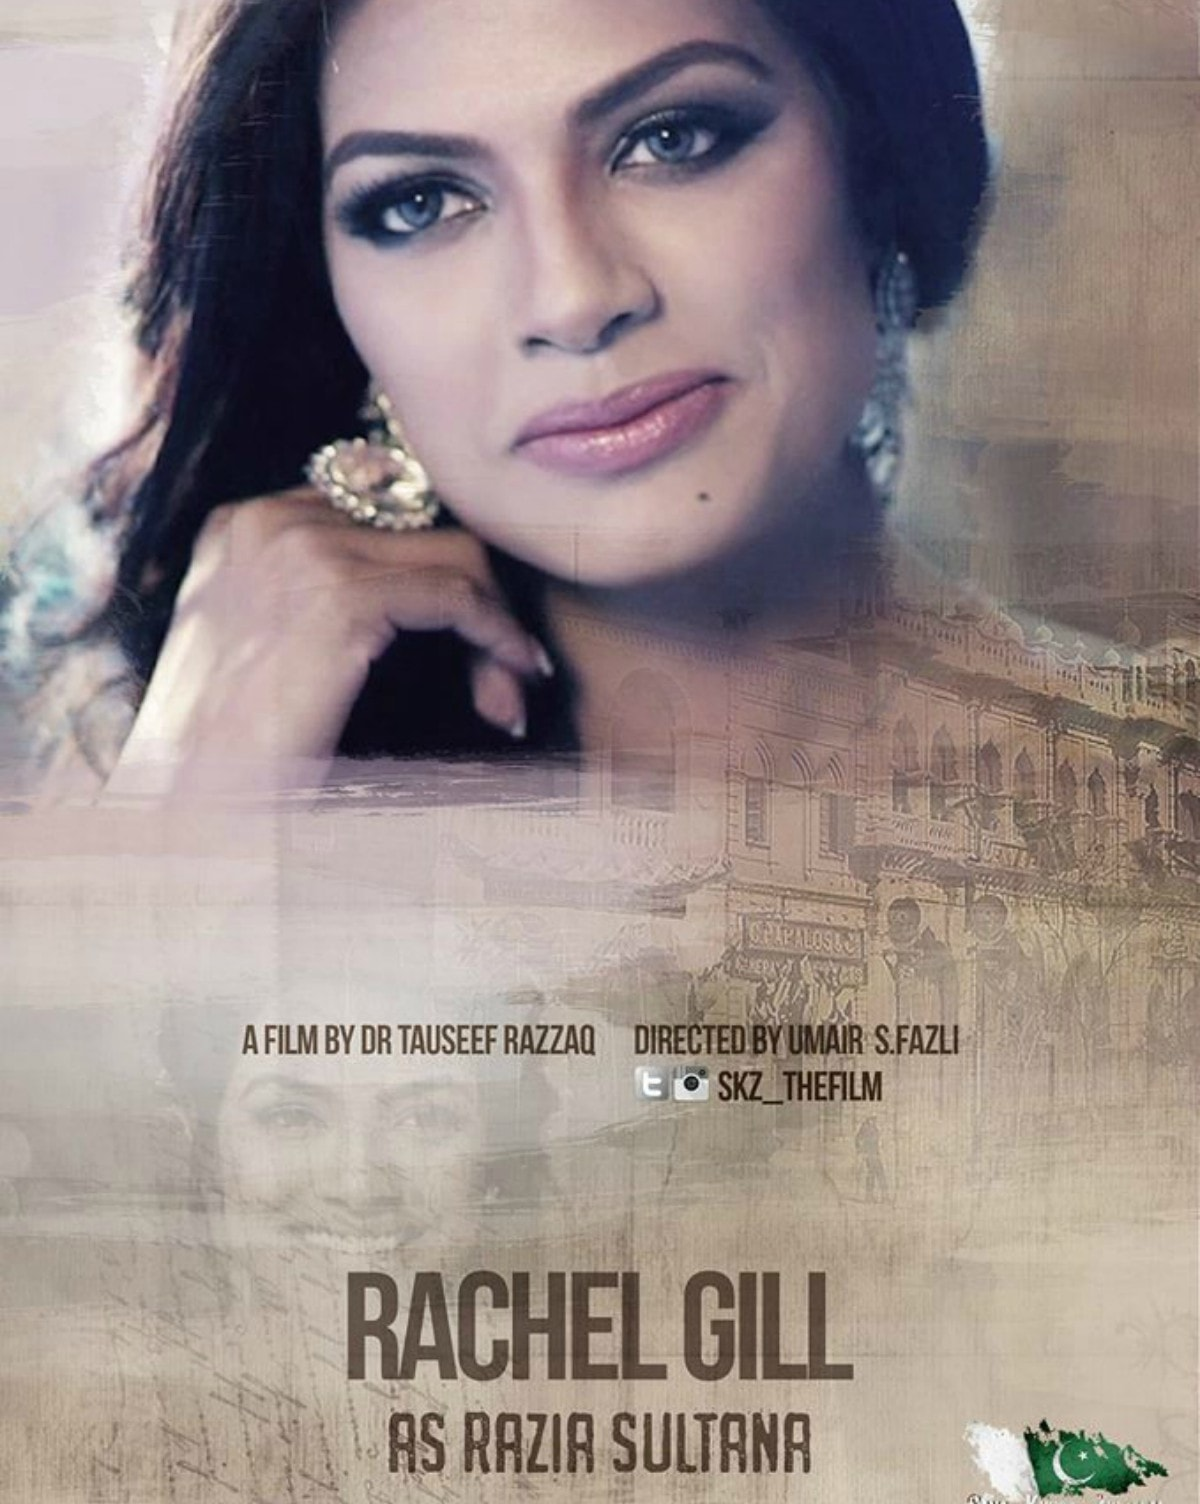 Rachel Gill as Razia Sultana in Saya e Khuda e Zuljulaal